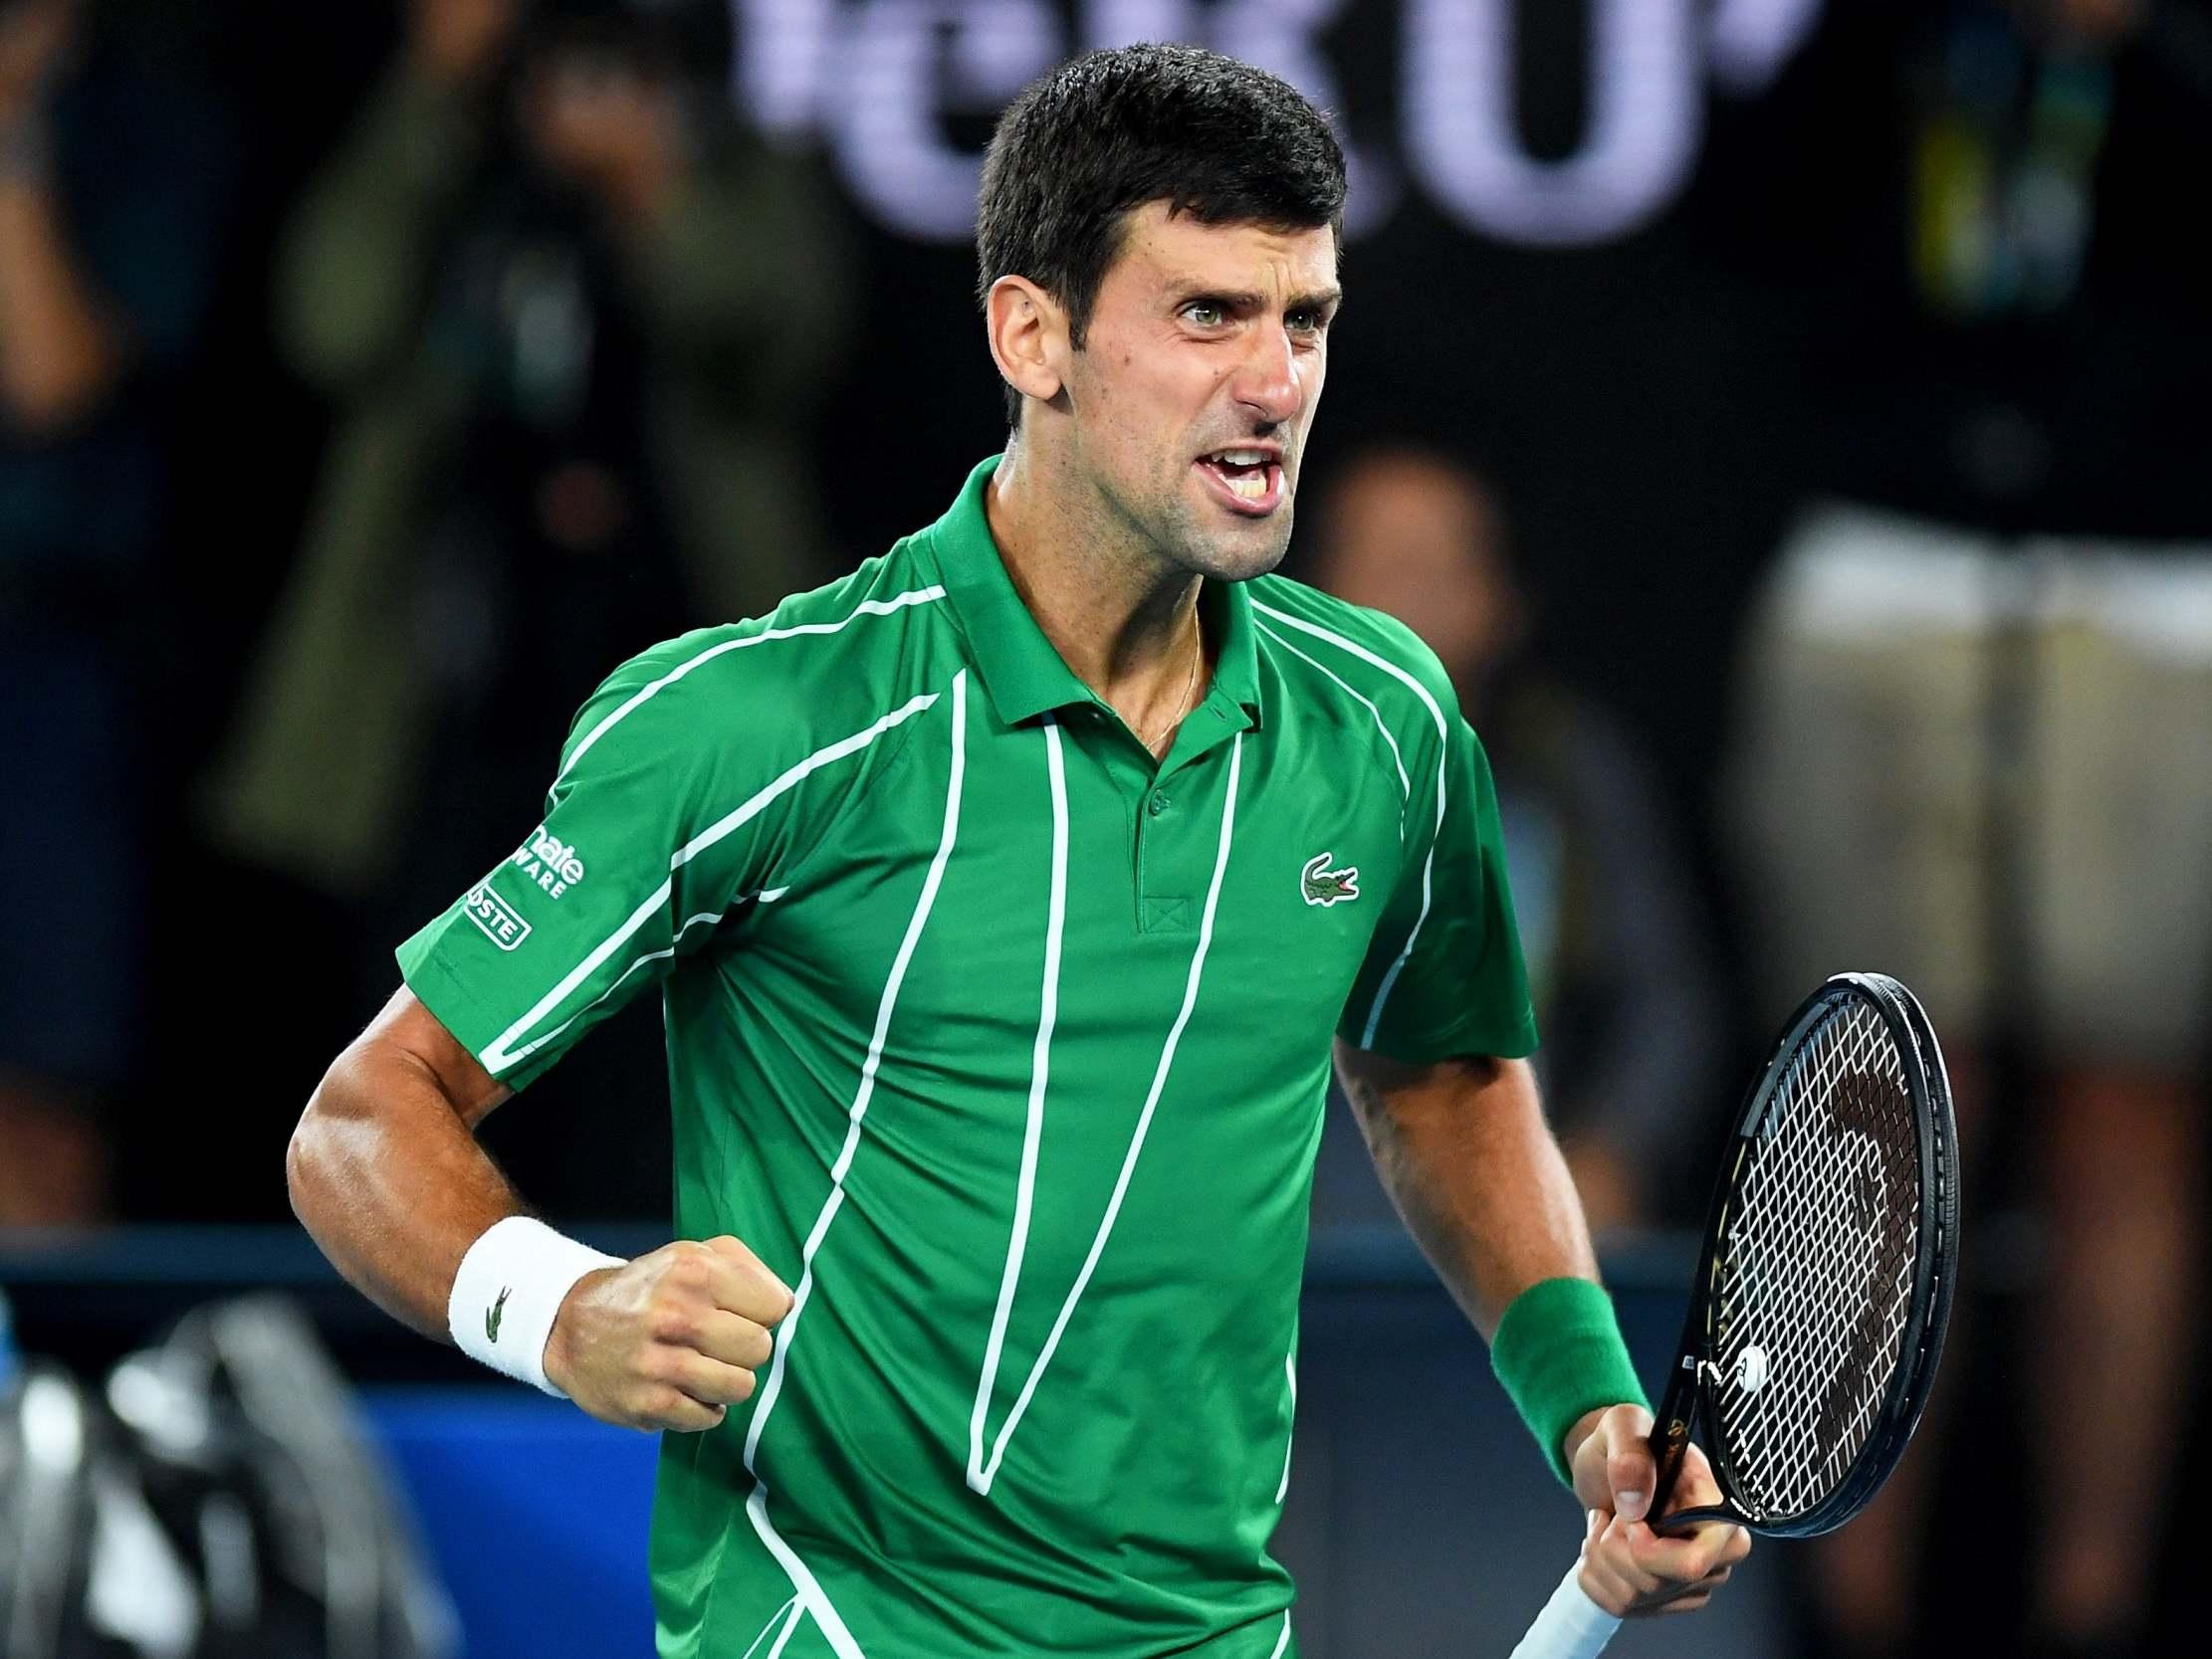 Australian Open 2020: Victorious Novak Djokovic relieved after 'turbulent' battle against Dominic Thiem